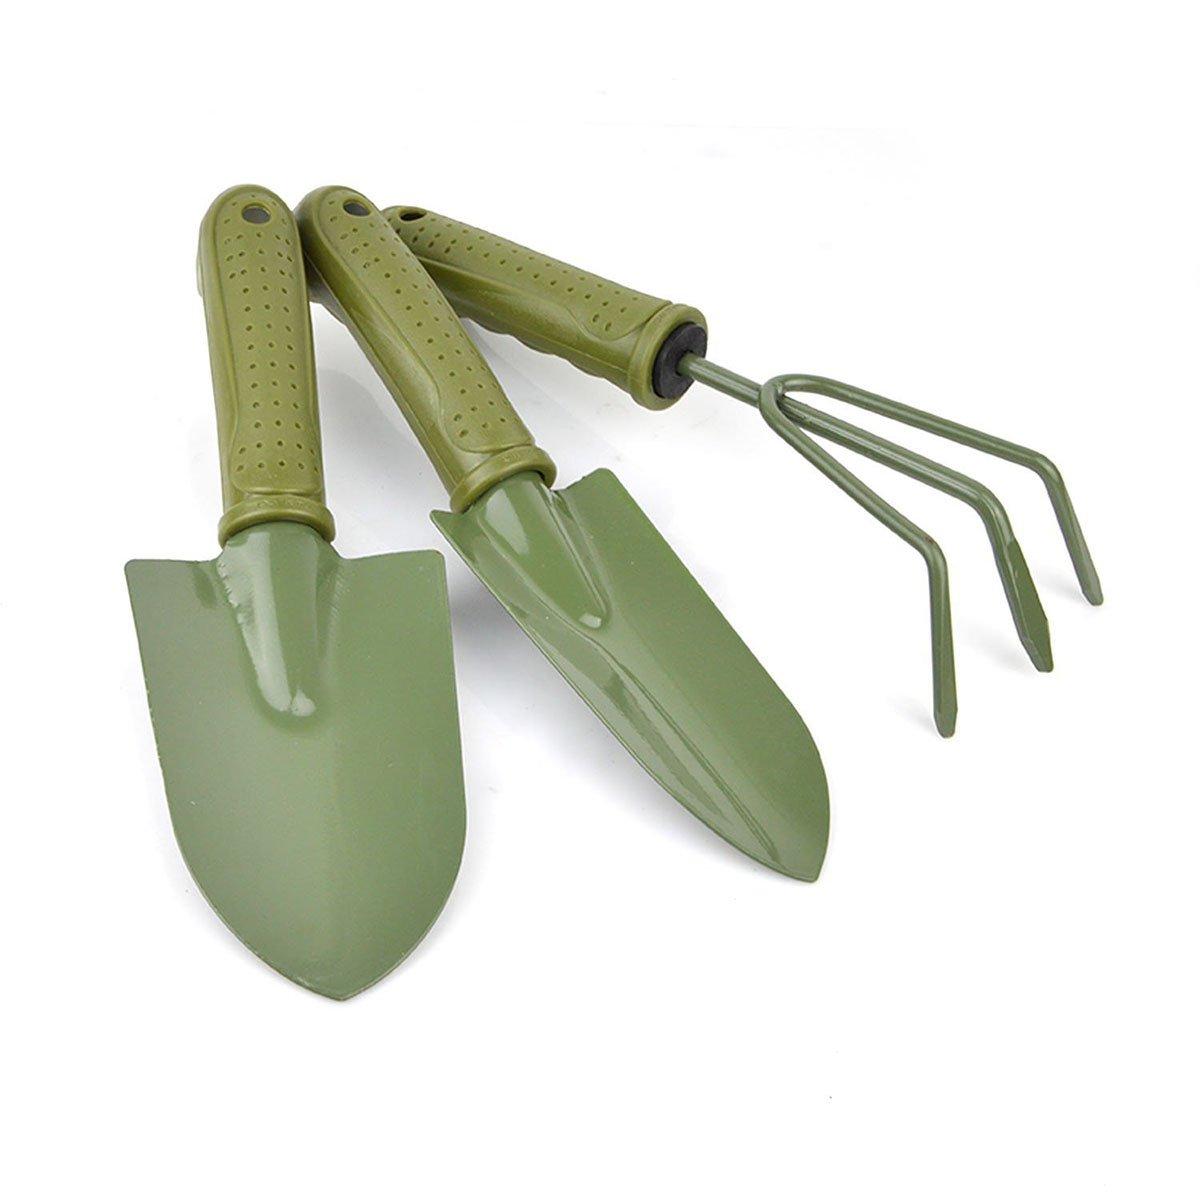 Freehawk Gardening Plant Pot 3 pieces Gardening Tools Small Shovel / Rake / Spade